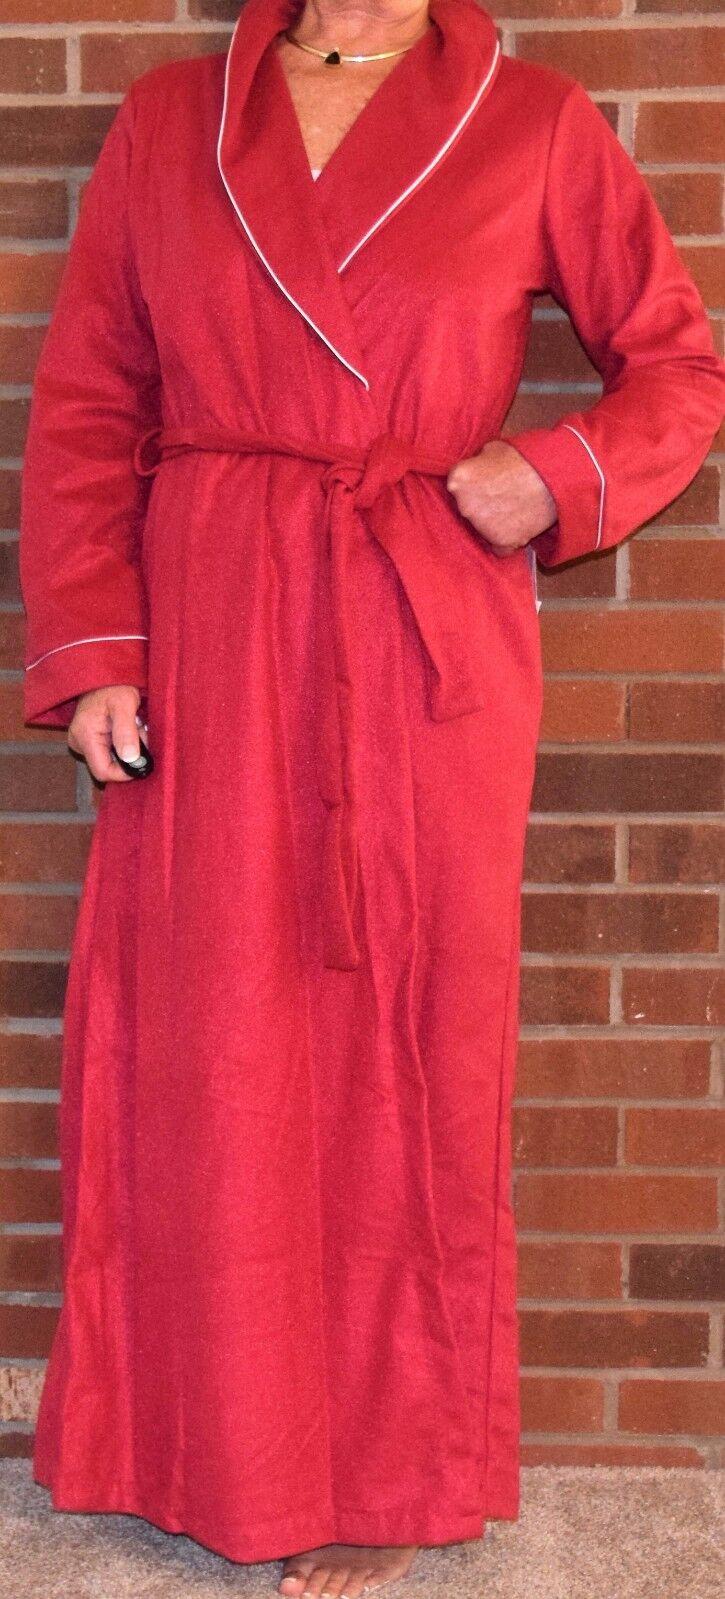 "Robe Wrap Fleece Great Length 55"" – 58"" Polyester Made in USA"